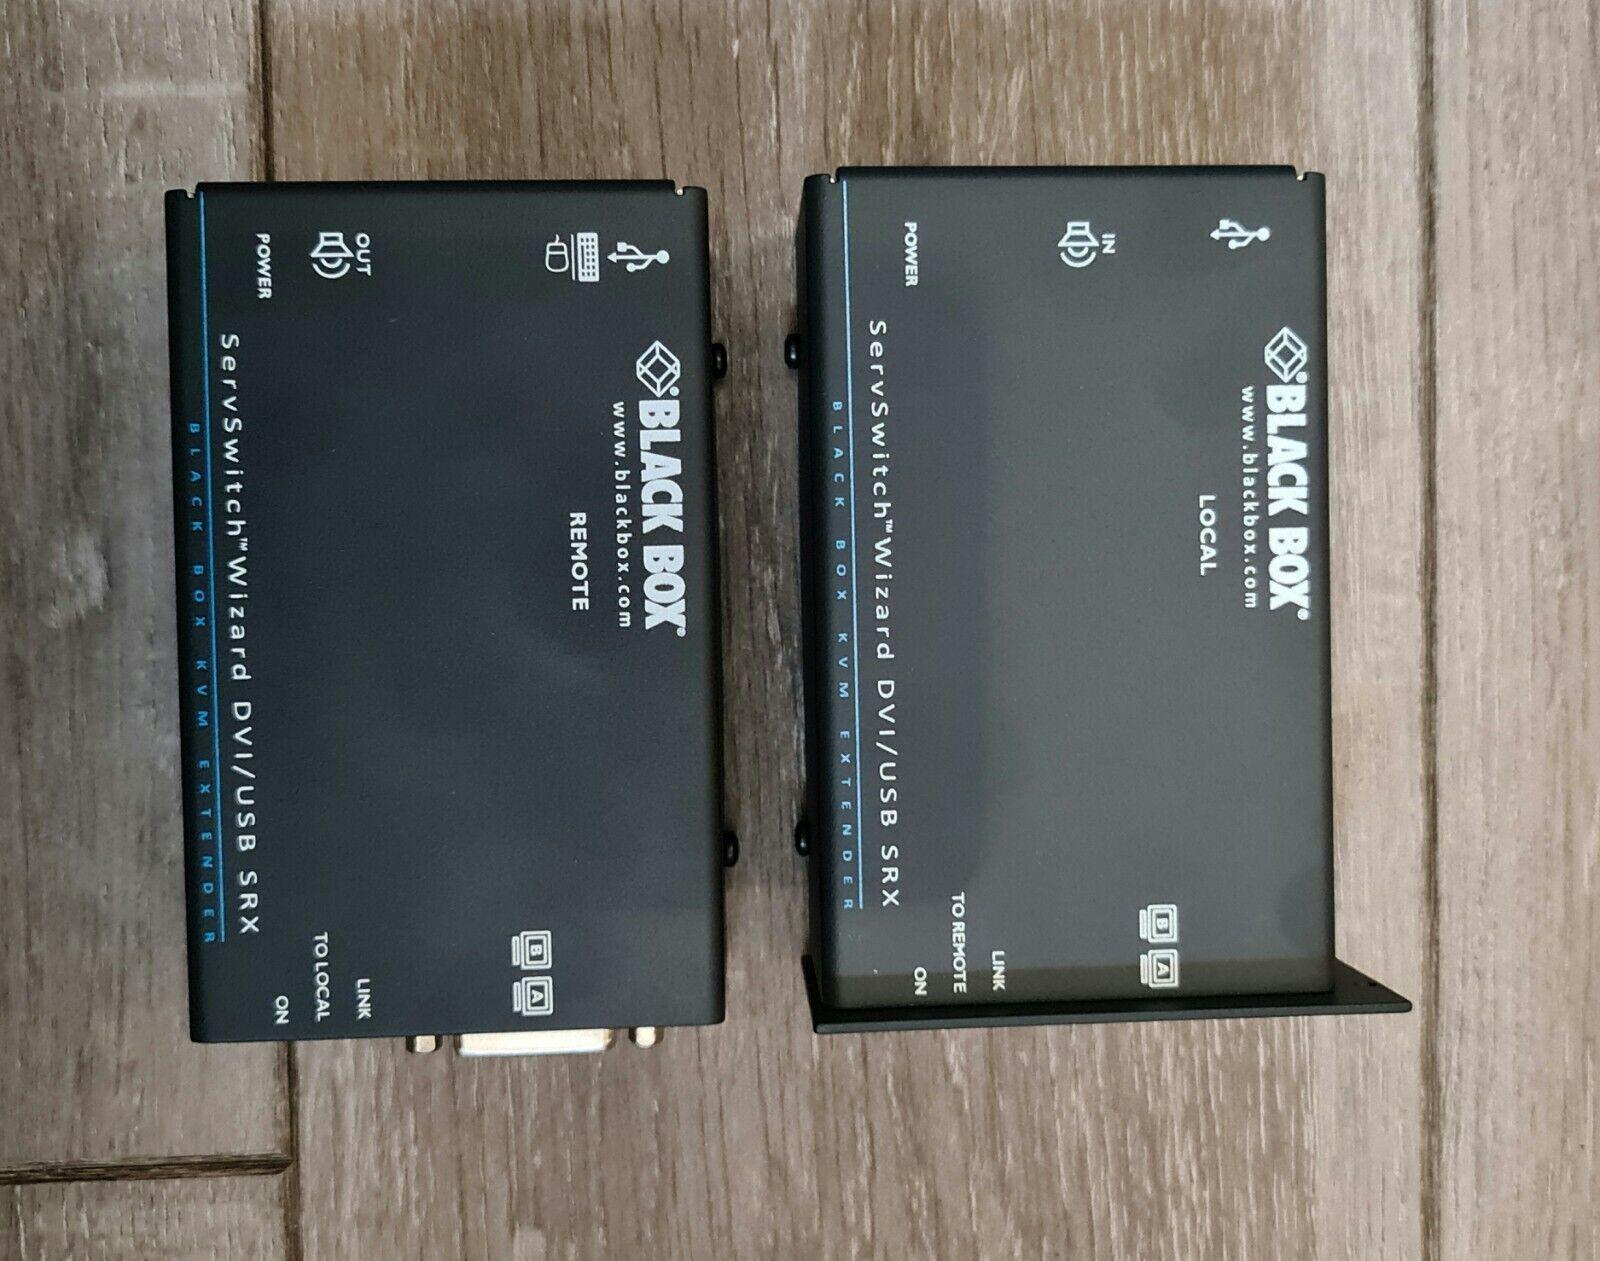 BLACK BOX ACU5502A-R3 DVI-D DUAL HEAD USB KVM EXTENDER